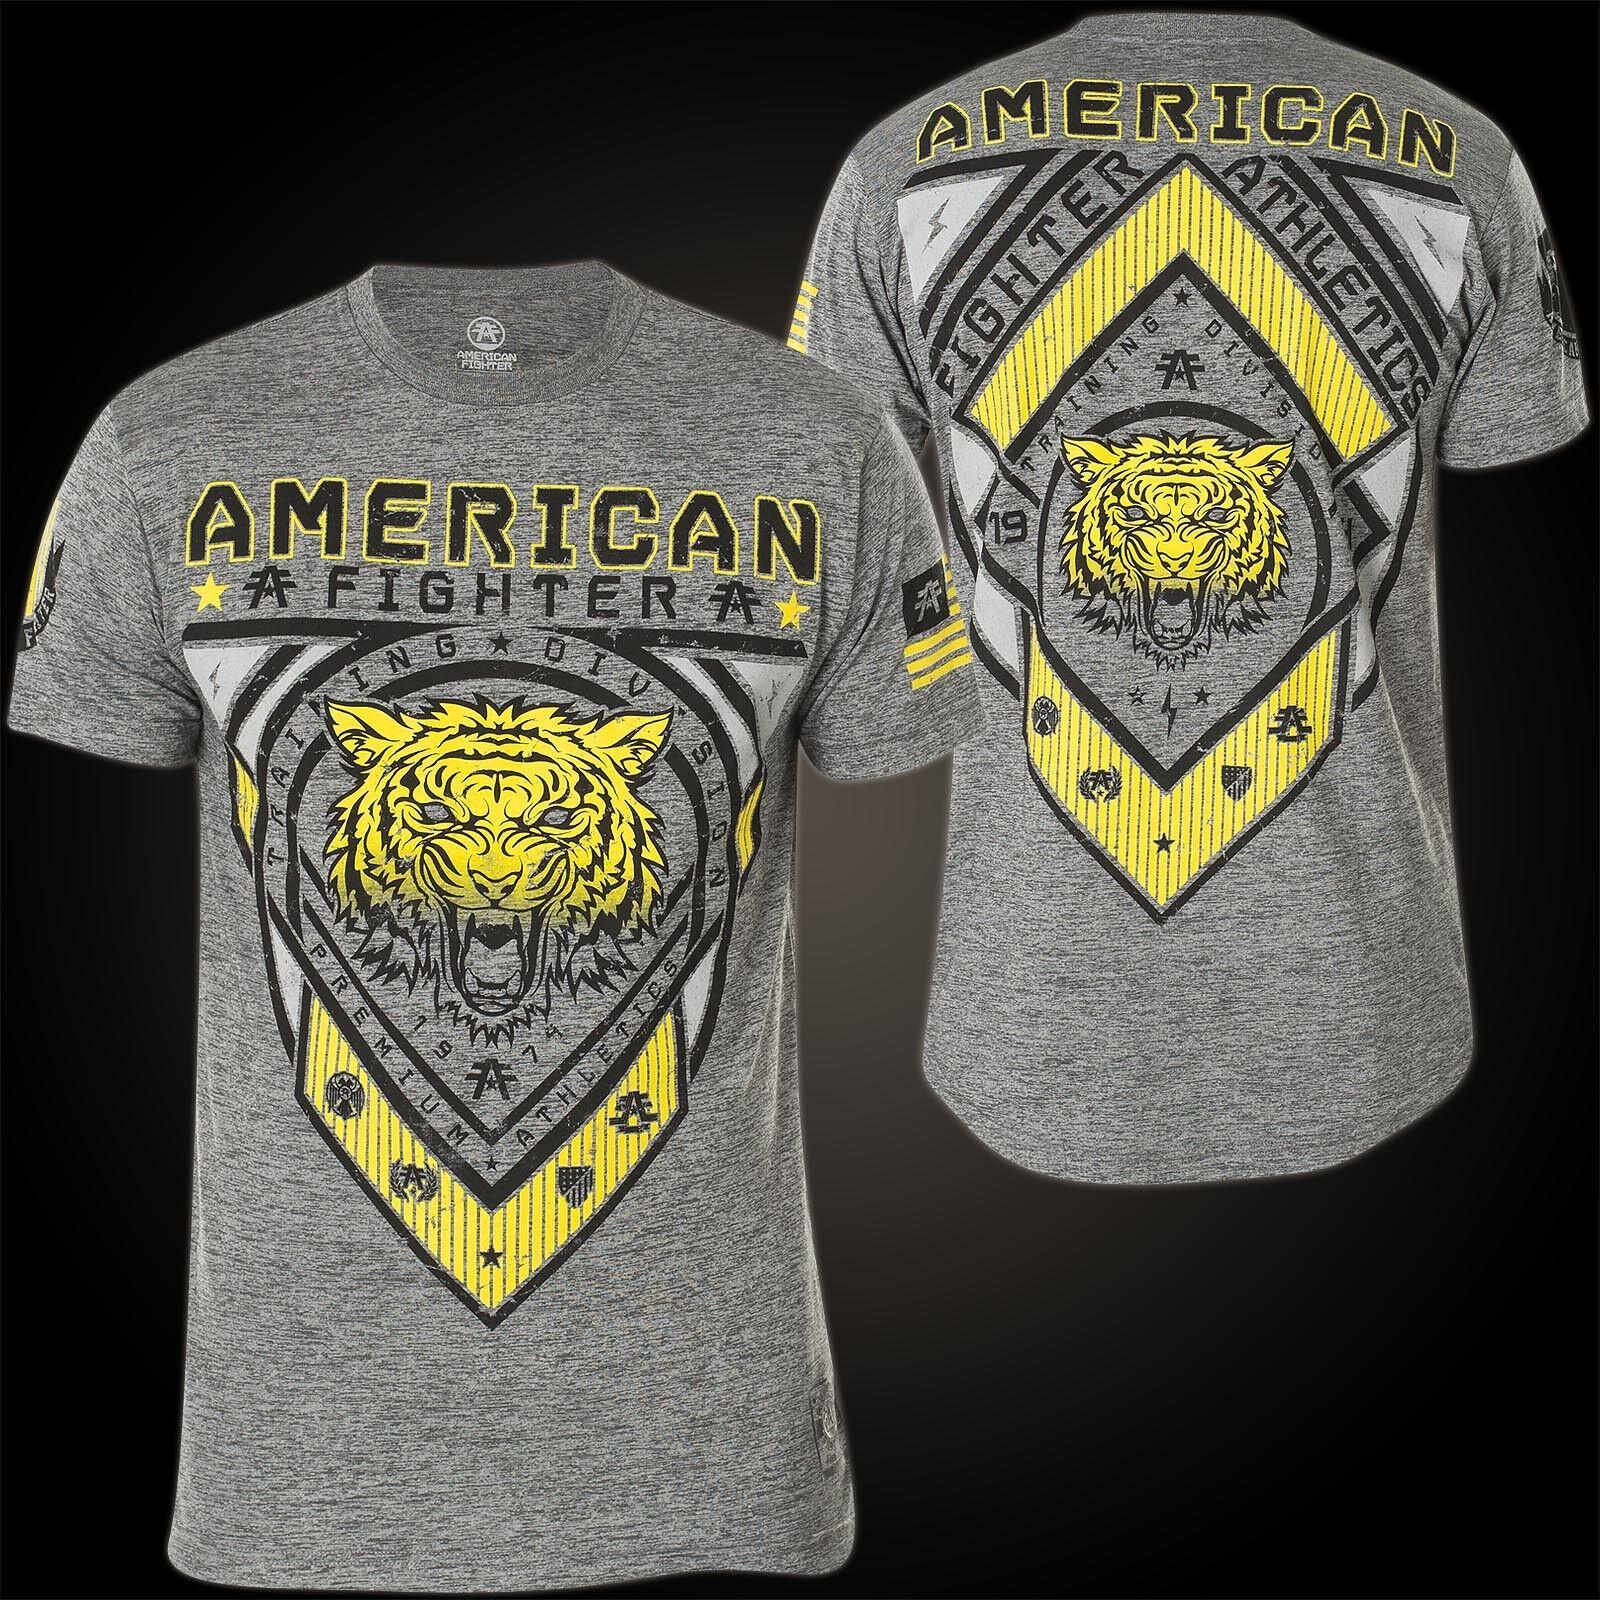 AMERICAN FIGHTER Affliction T-Shirt T-Shirt T-Shirt Chesterbrook Grau T-Shirts 6a6830